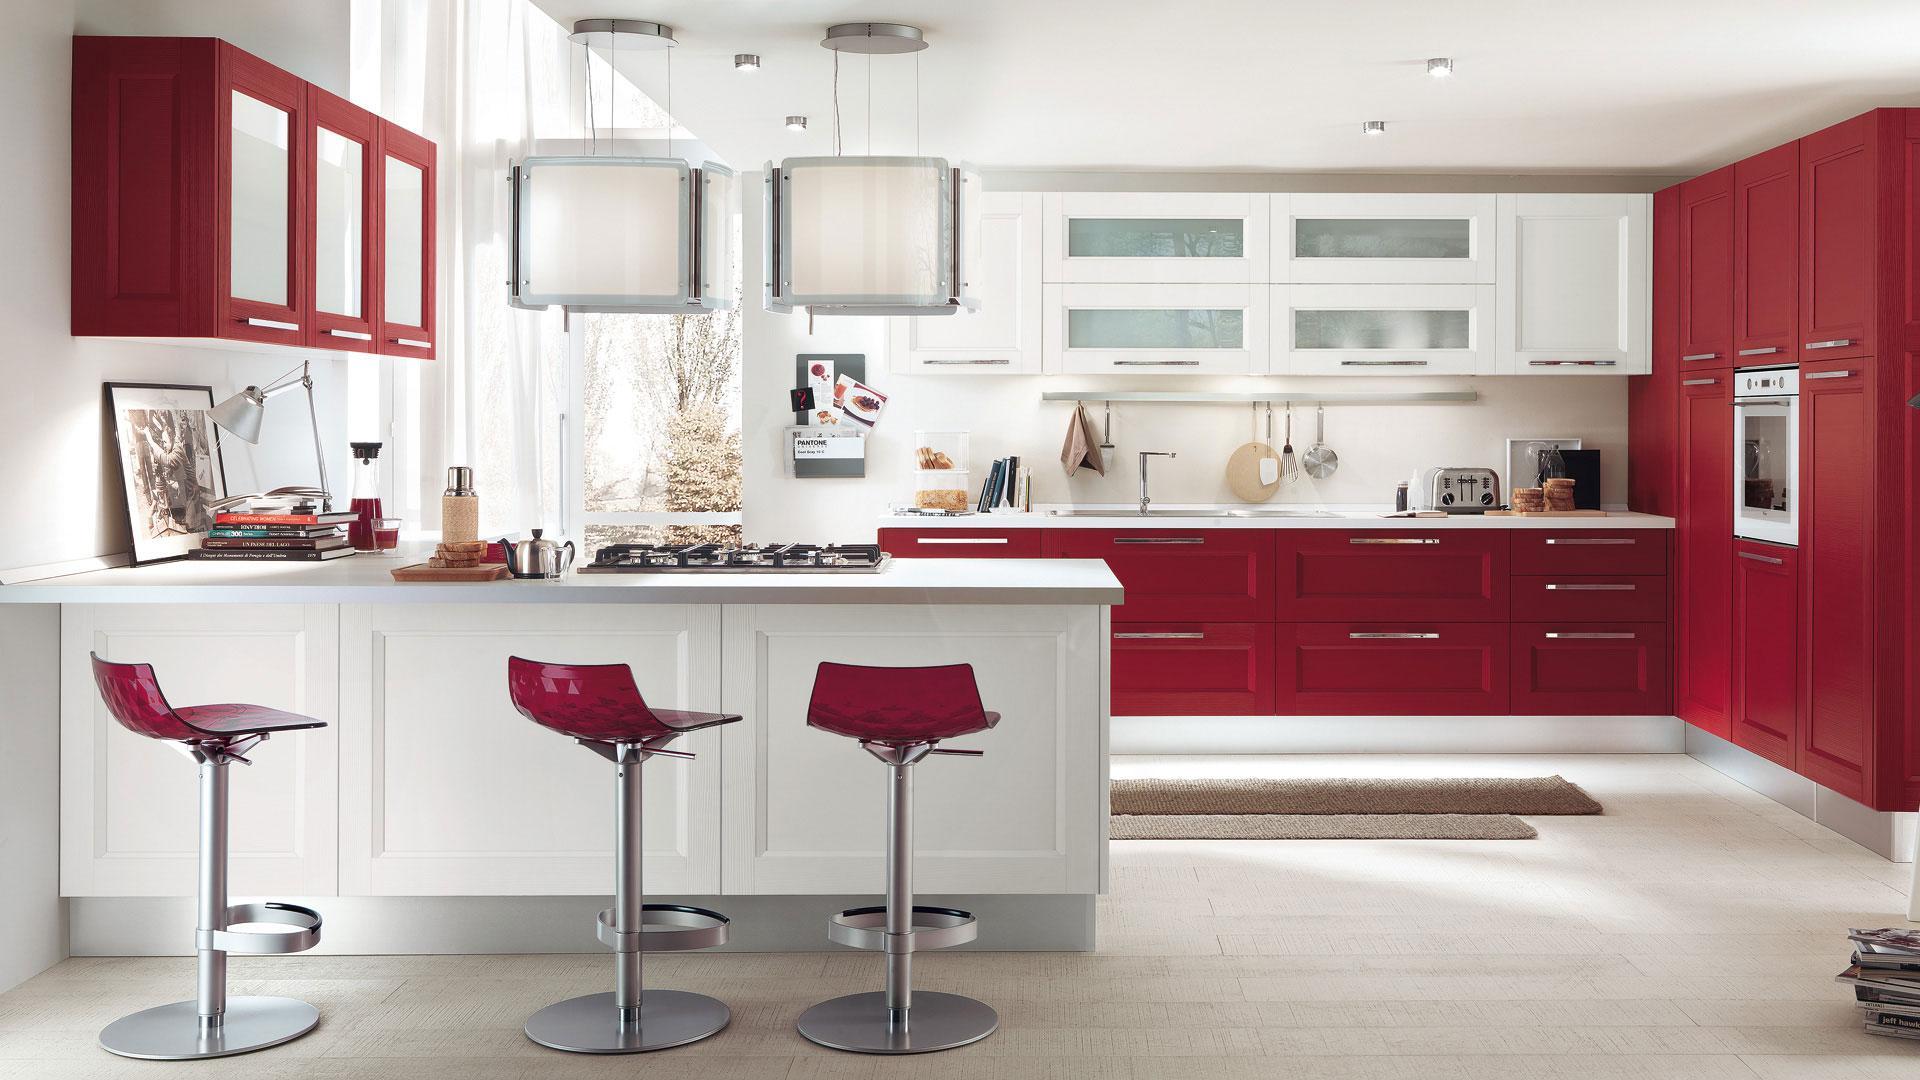 . Idee Arredamento Cucina Ikea. Idee Arredamento Salotto Cucina #7A252F 1920 1080 Progettare Una Cucina On Line Gratis